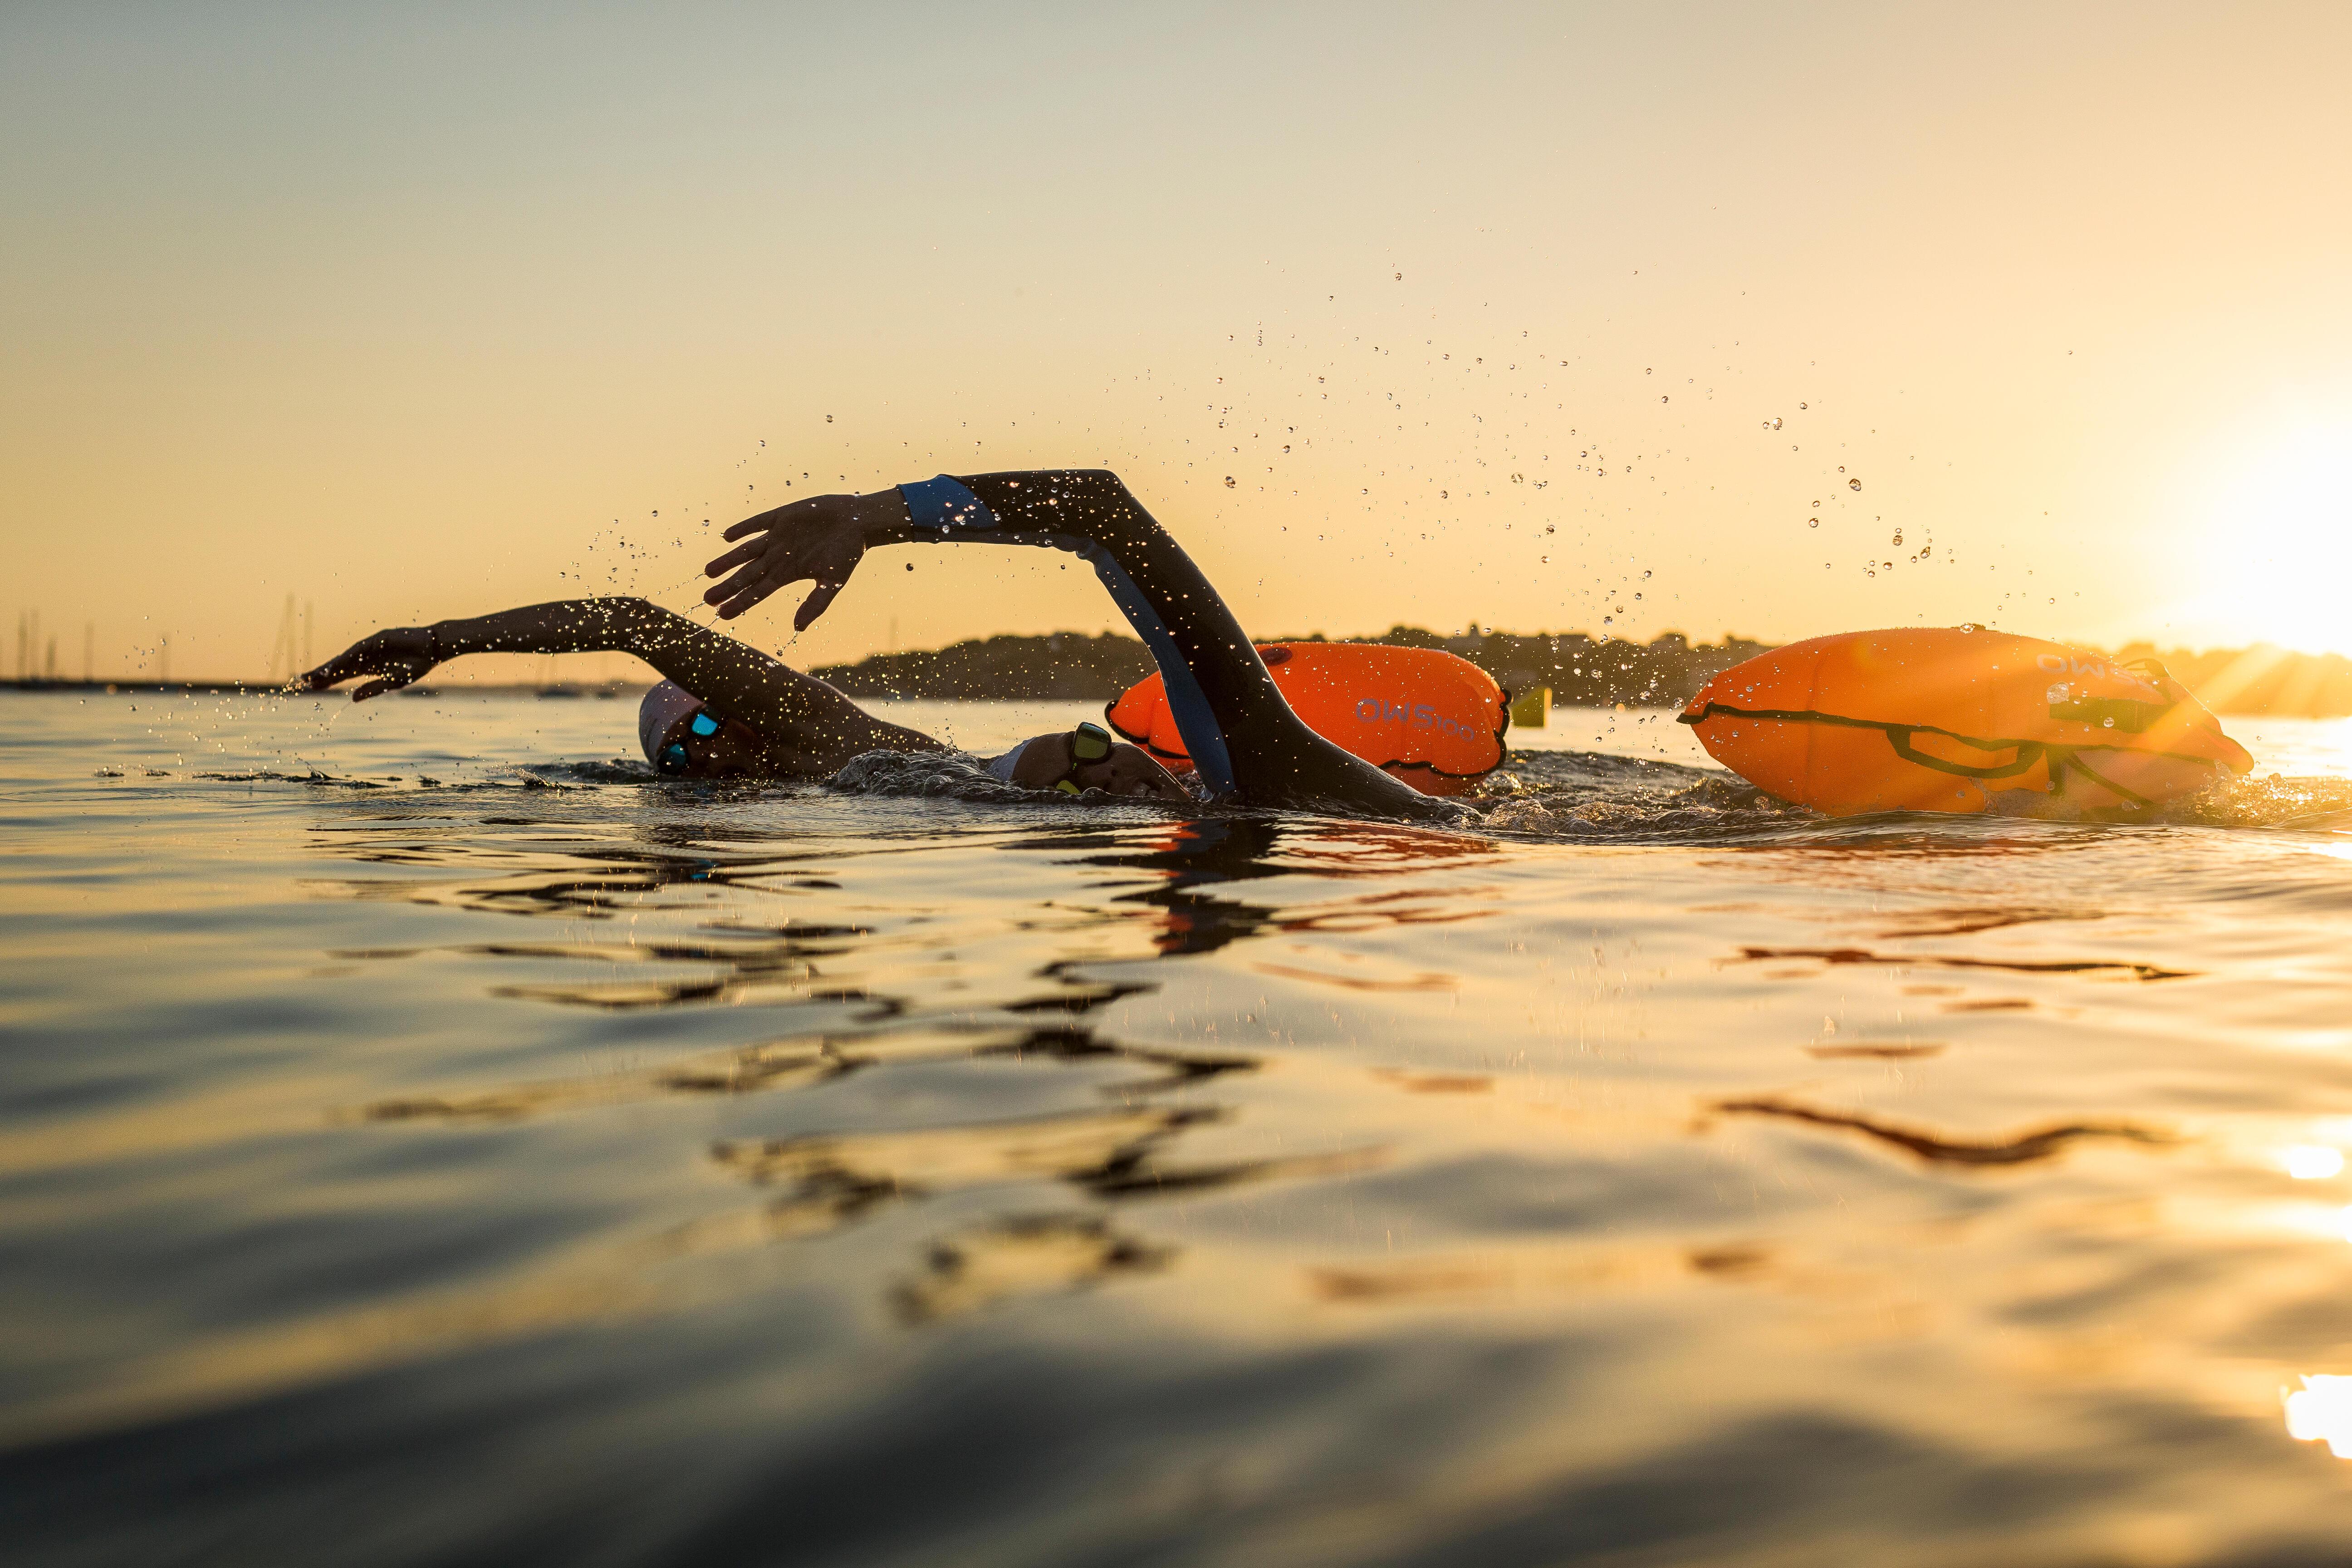 nage-eau-libre-securite-debuter